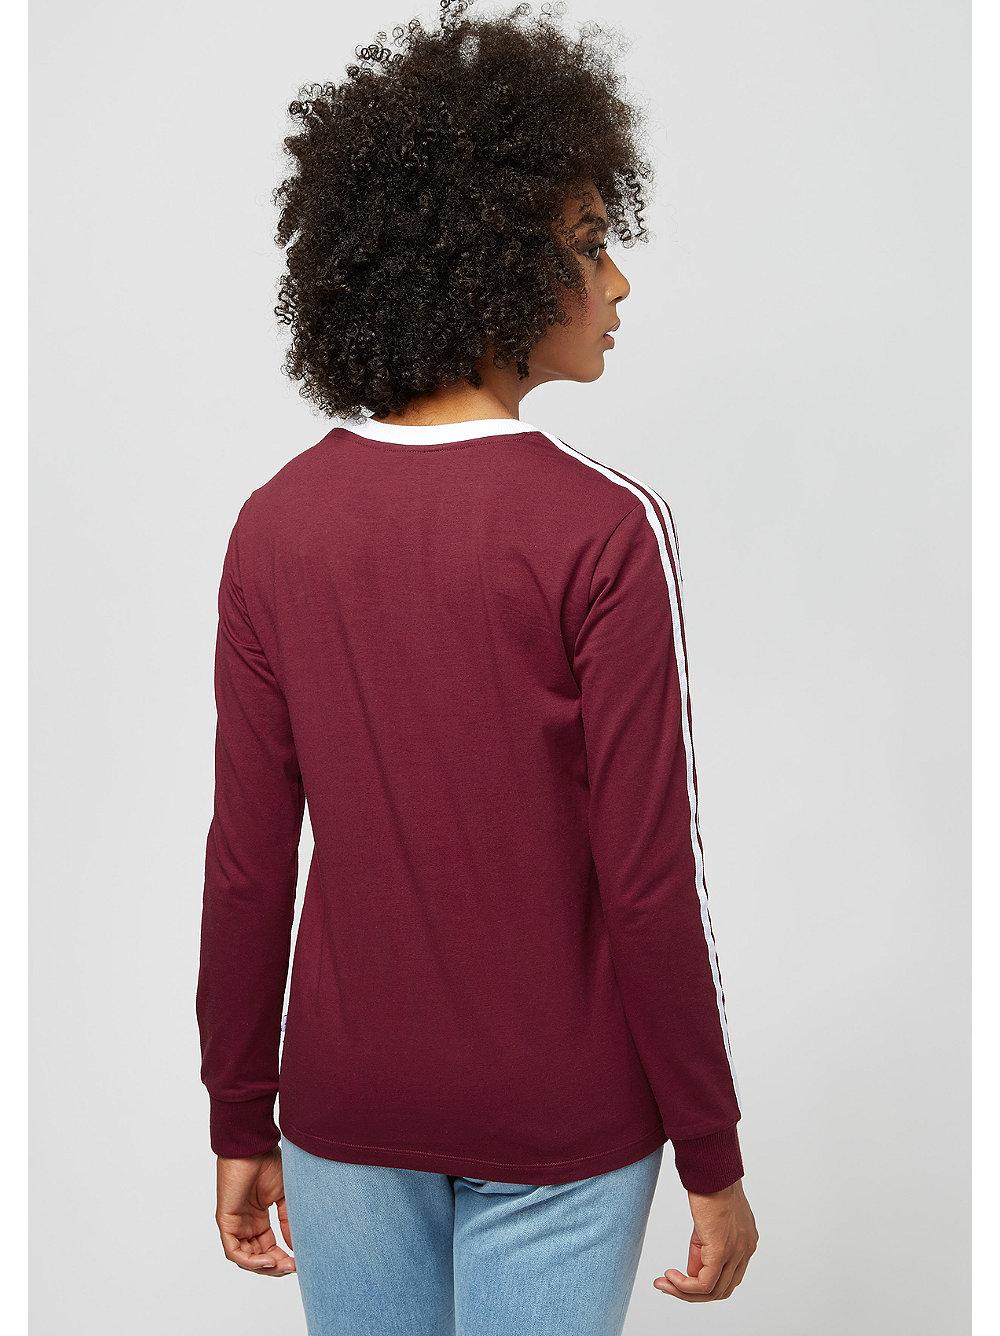 camiseta adidas 3 rayas burgundy